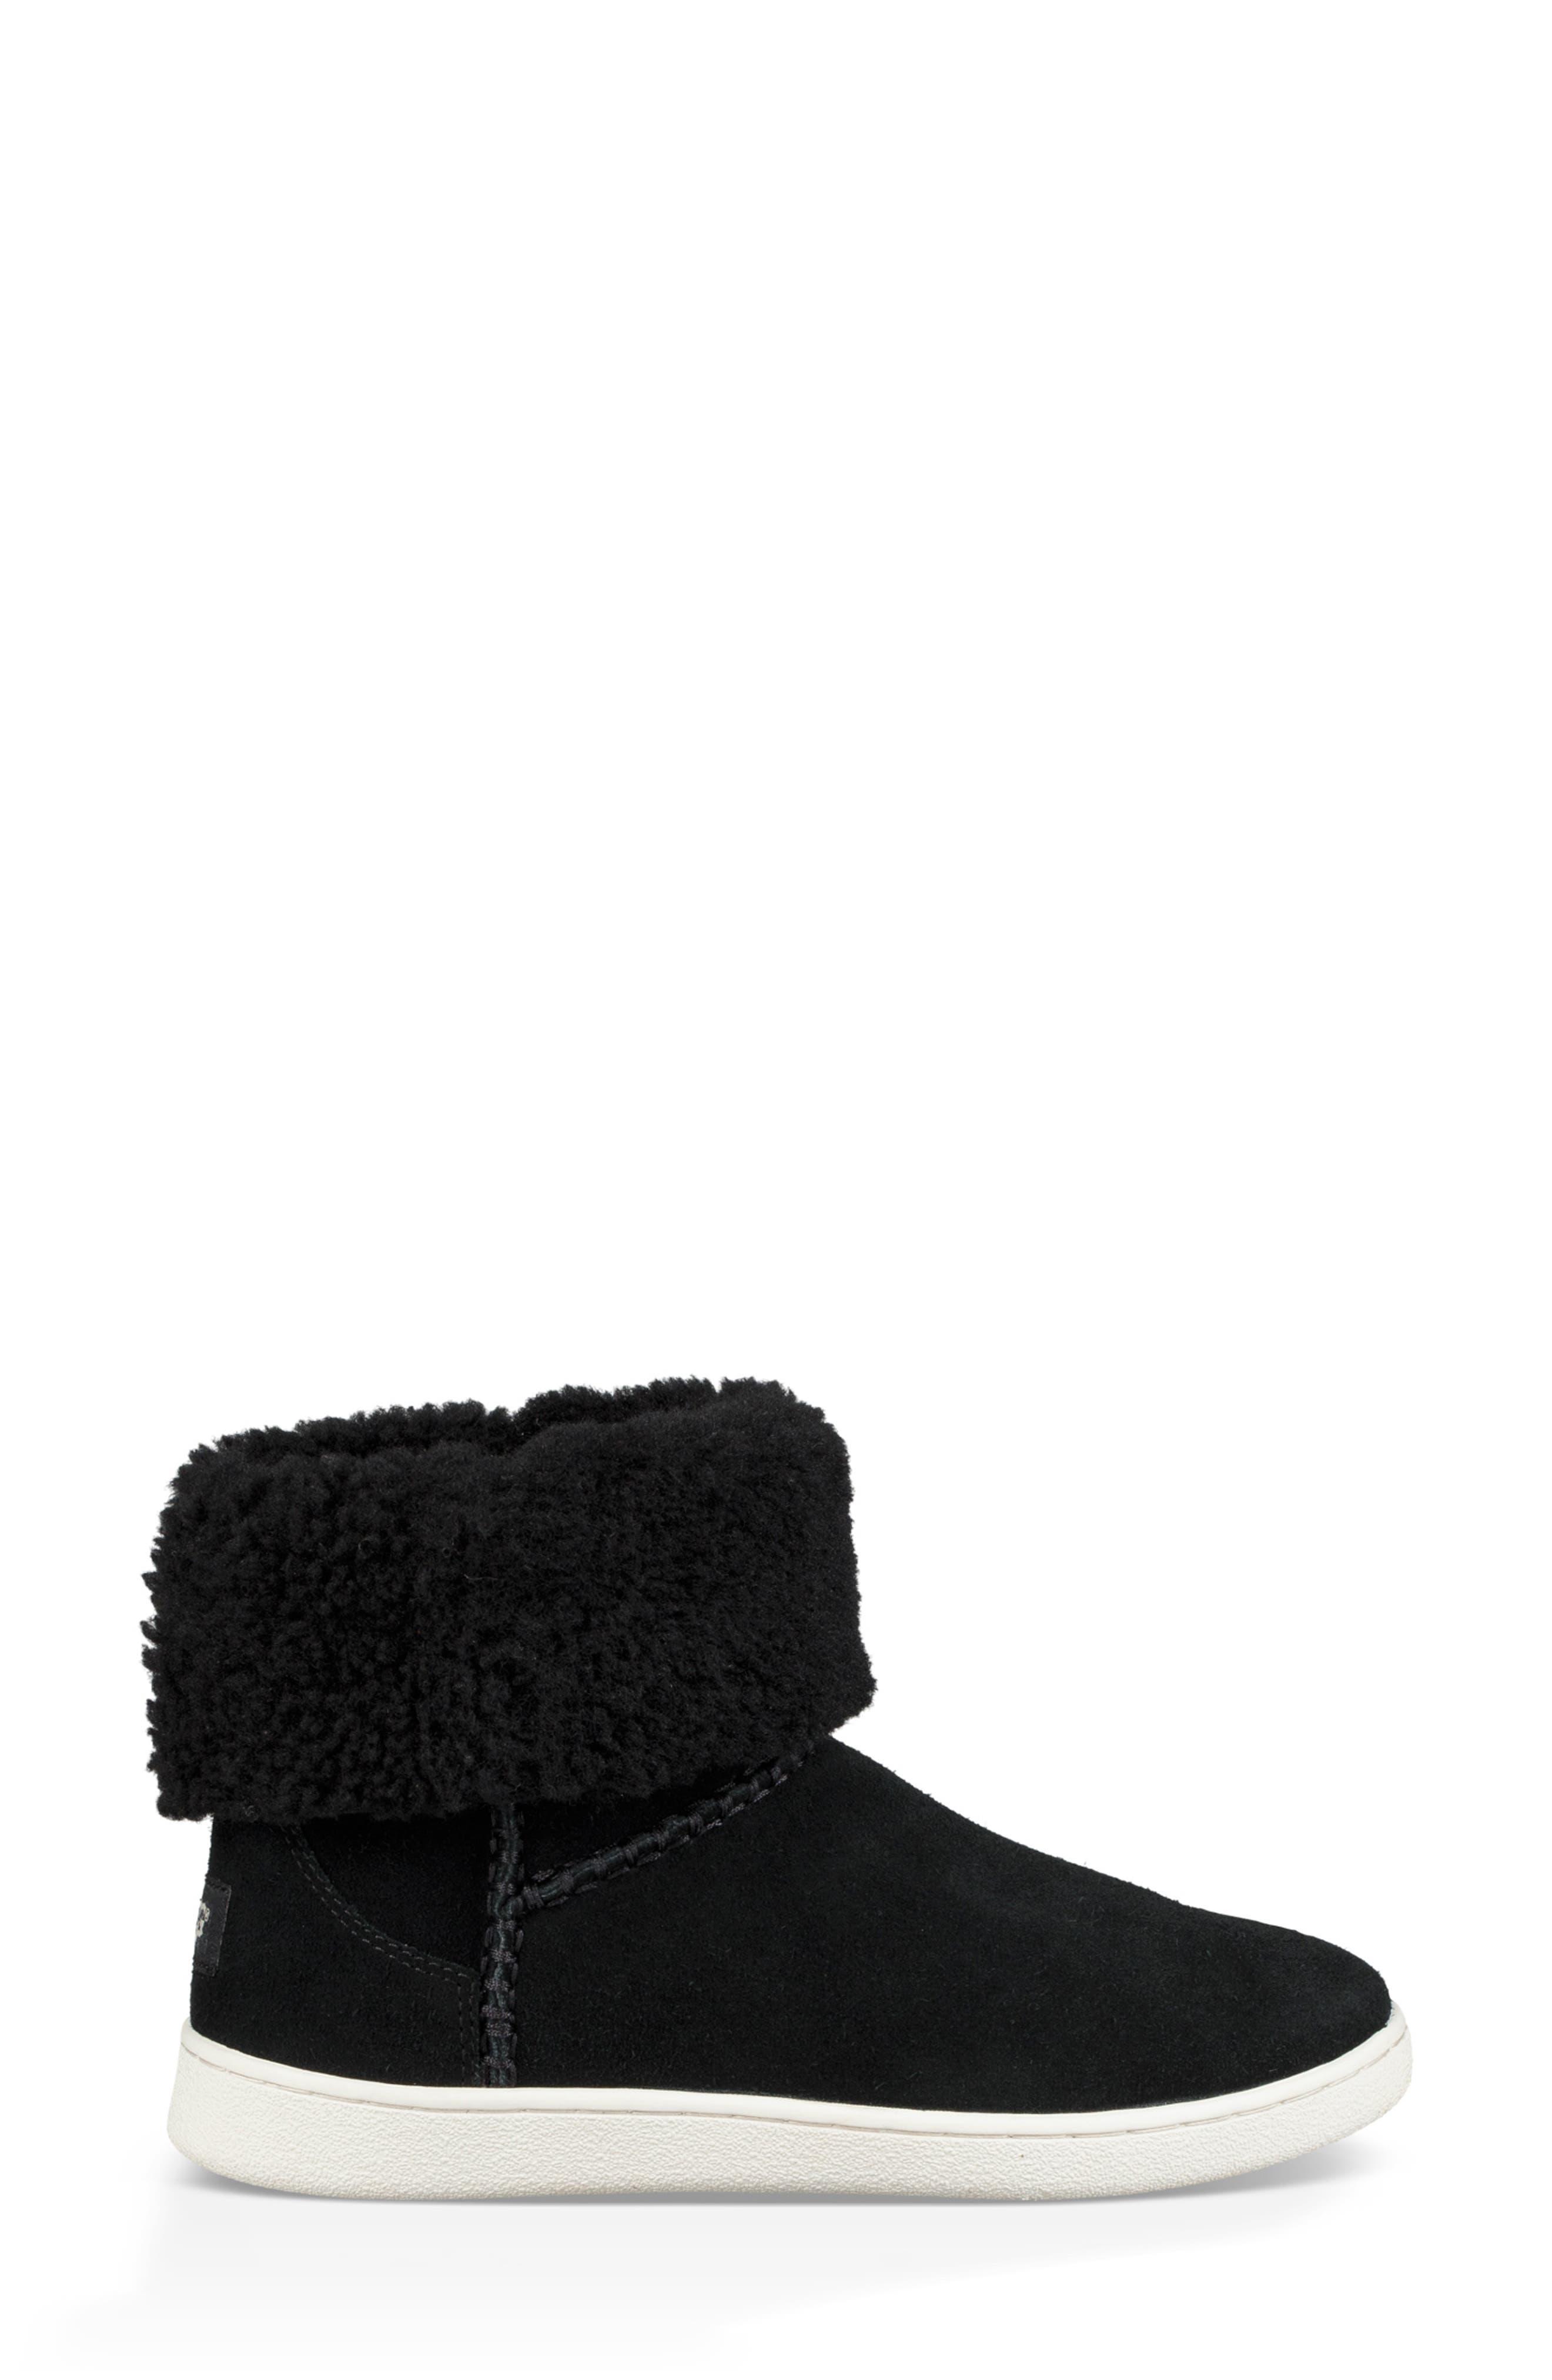 Mika Classic Genuine Shearling Sneaker,                             Alternate thumbnail 4, color,                             BLACK